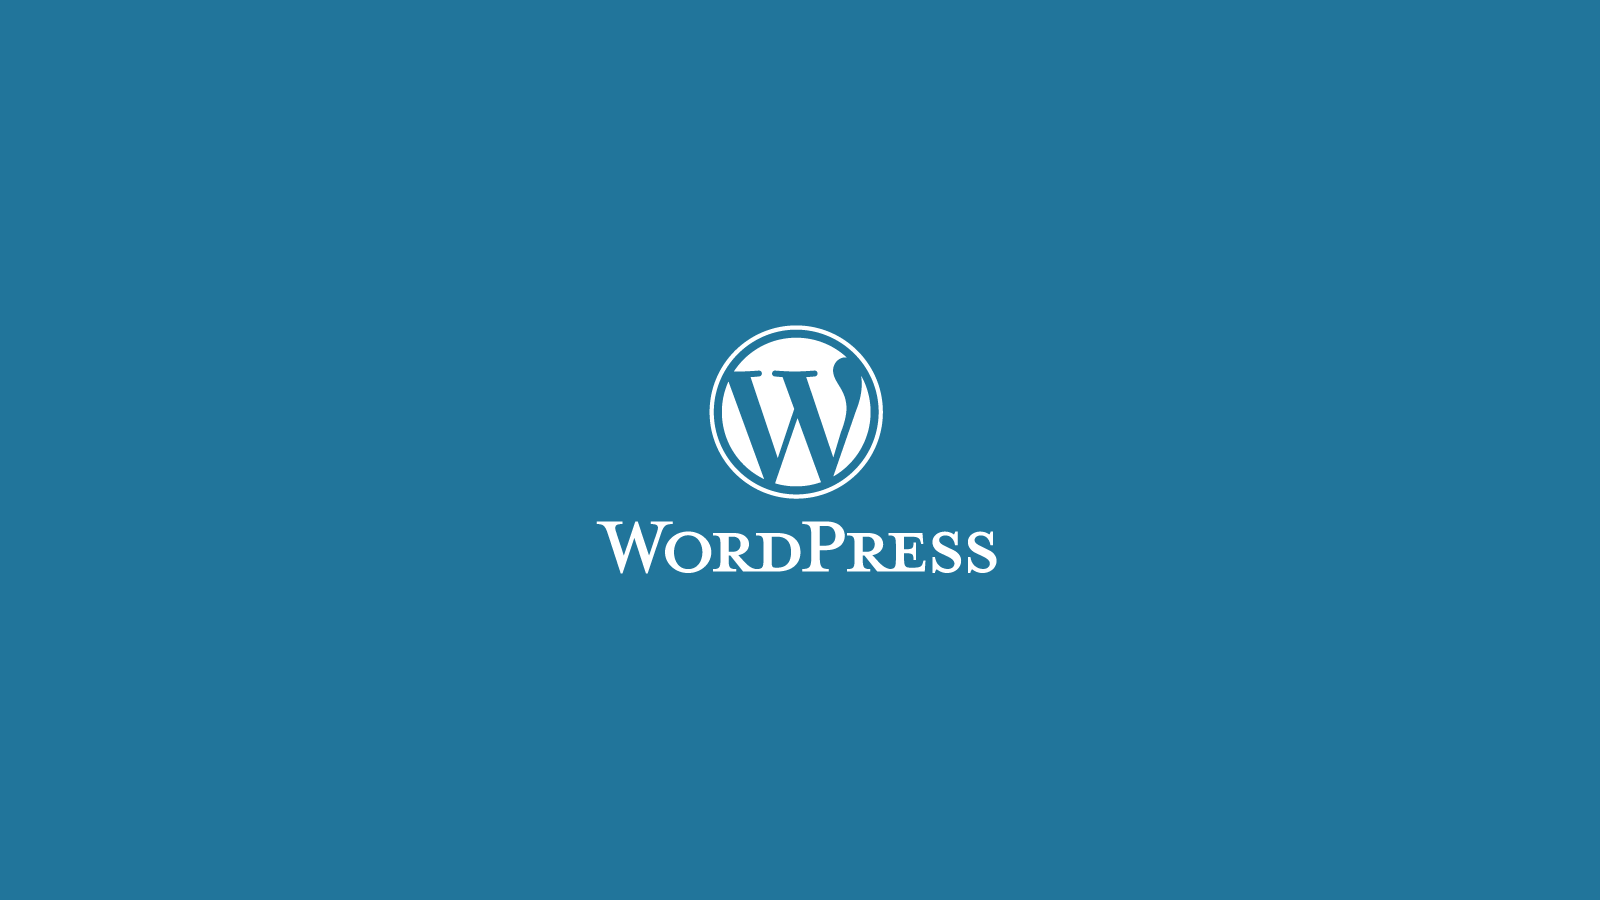 how to change size of logo wordpress